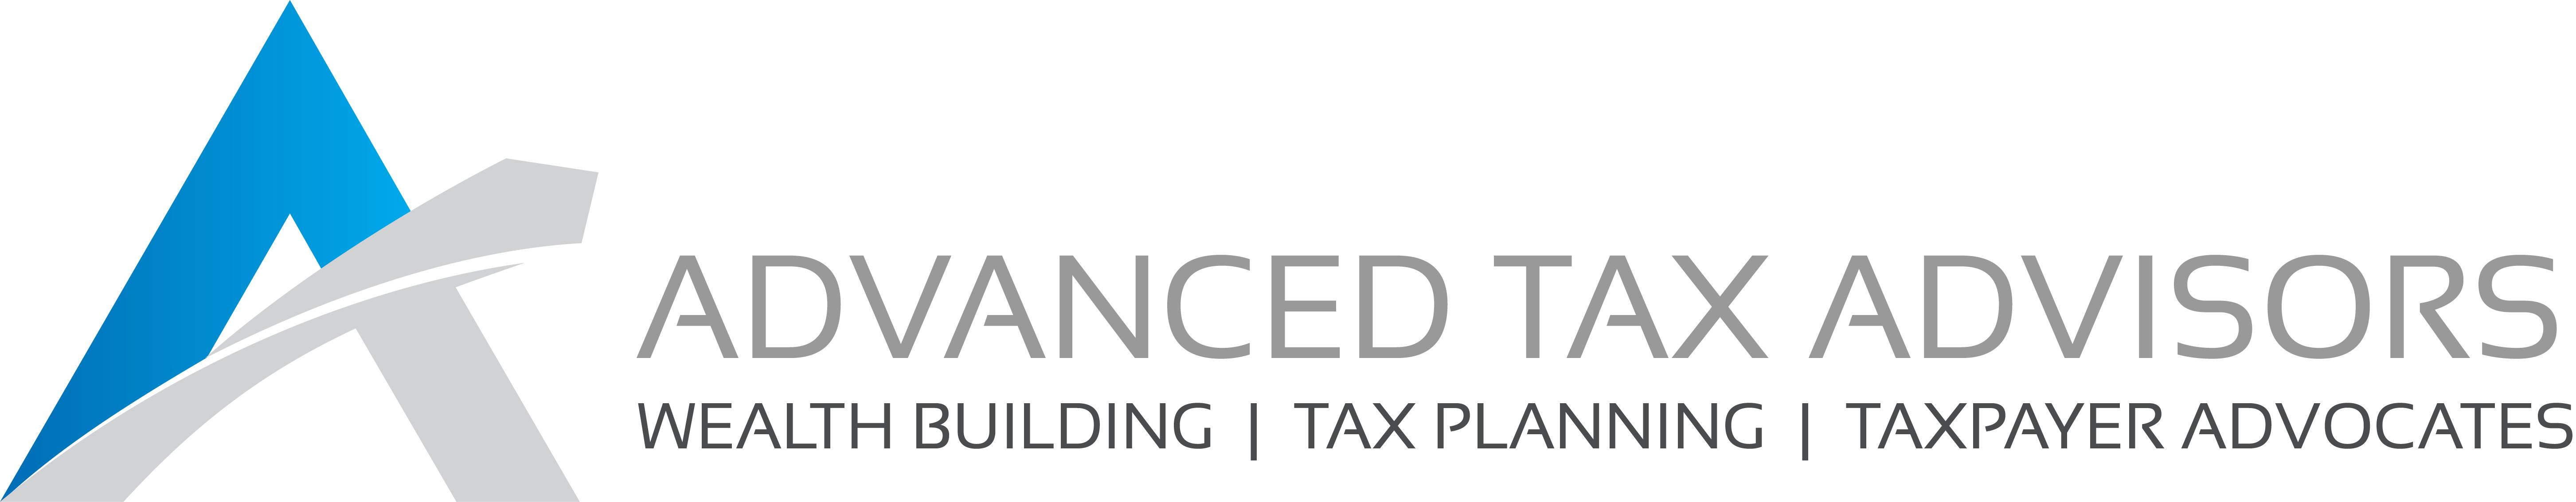 Advanced Tax Advisors